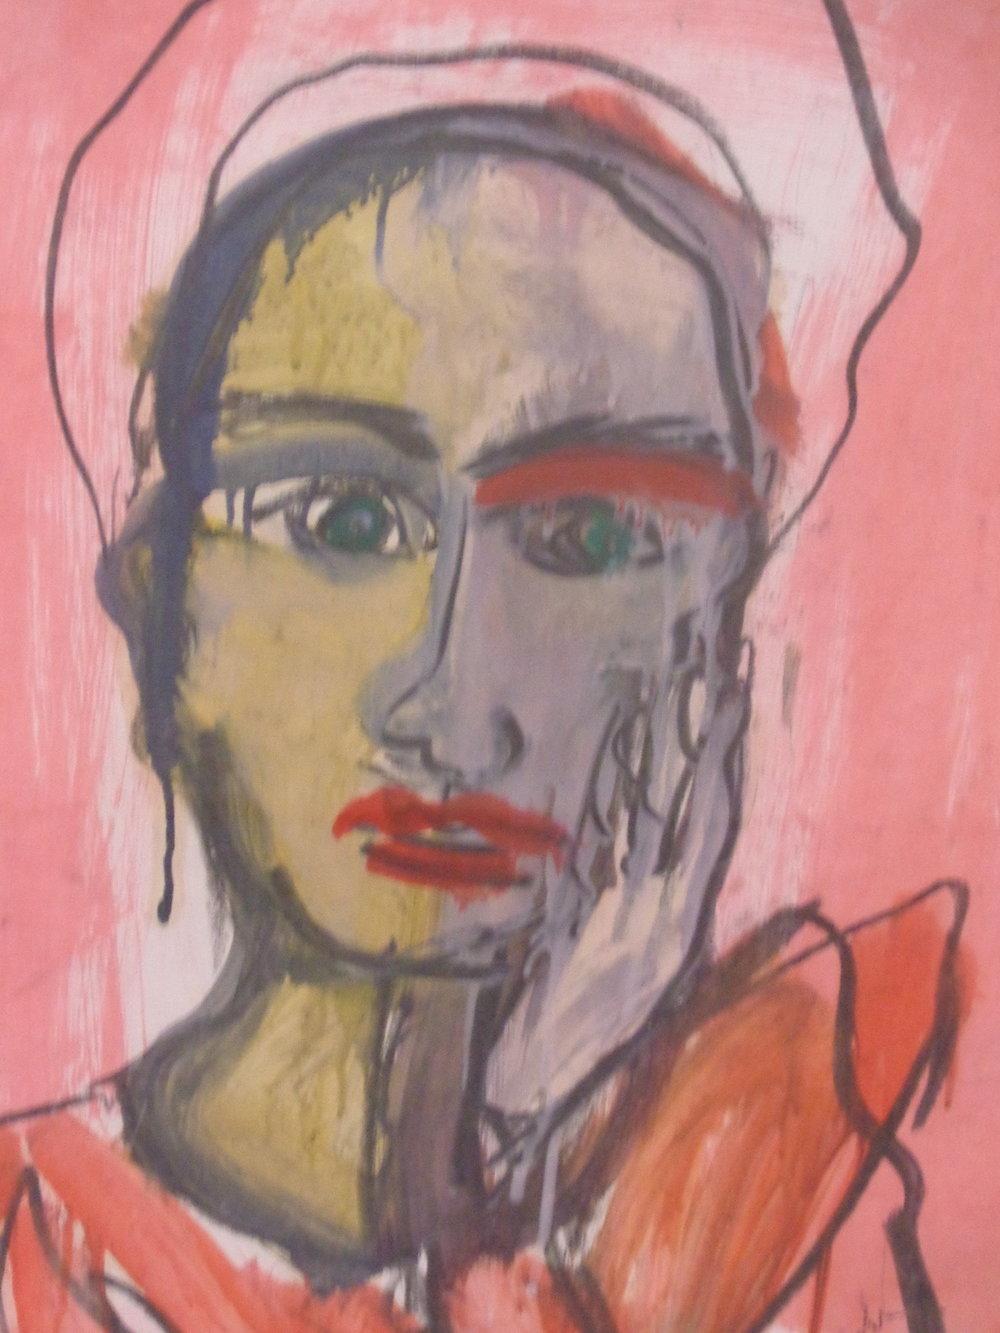 Claire Petit - Oil on Paper 2010